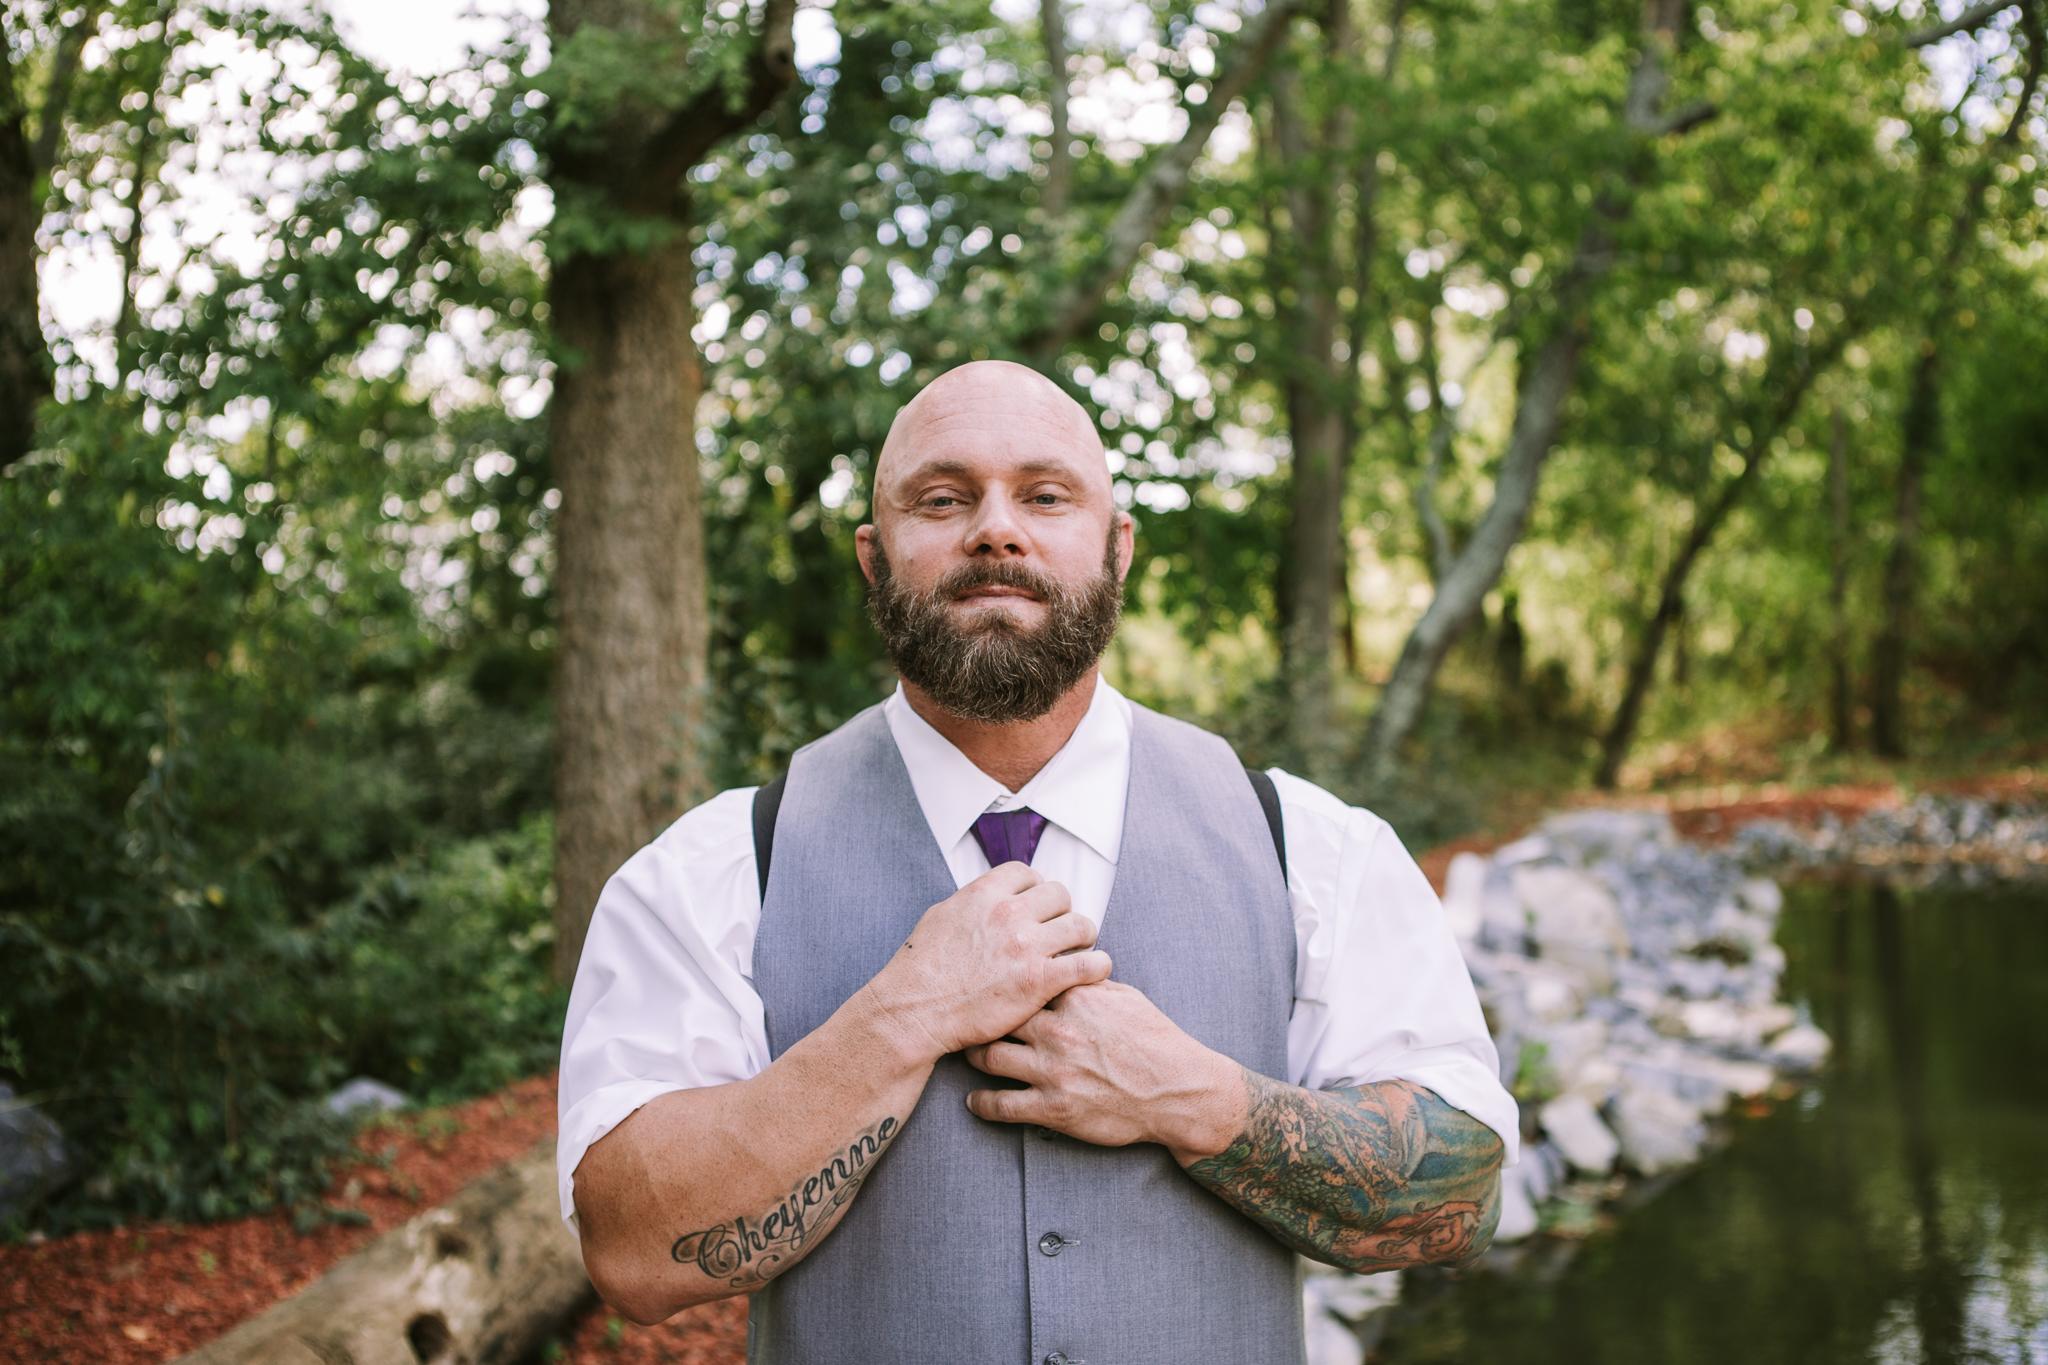 Richmond Kentucky Wedding Photographer - Ariana Jordan Photography -3.jpg